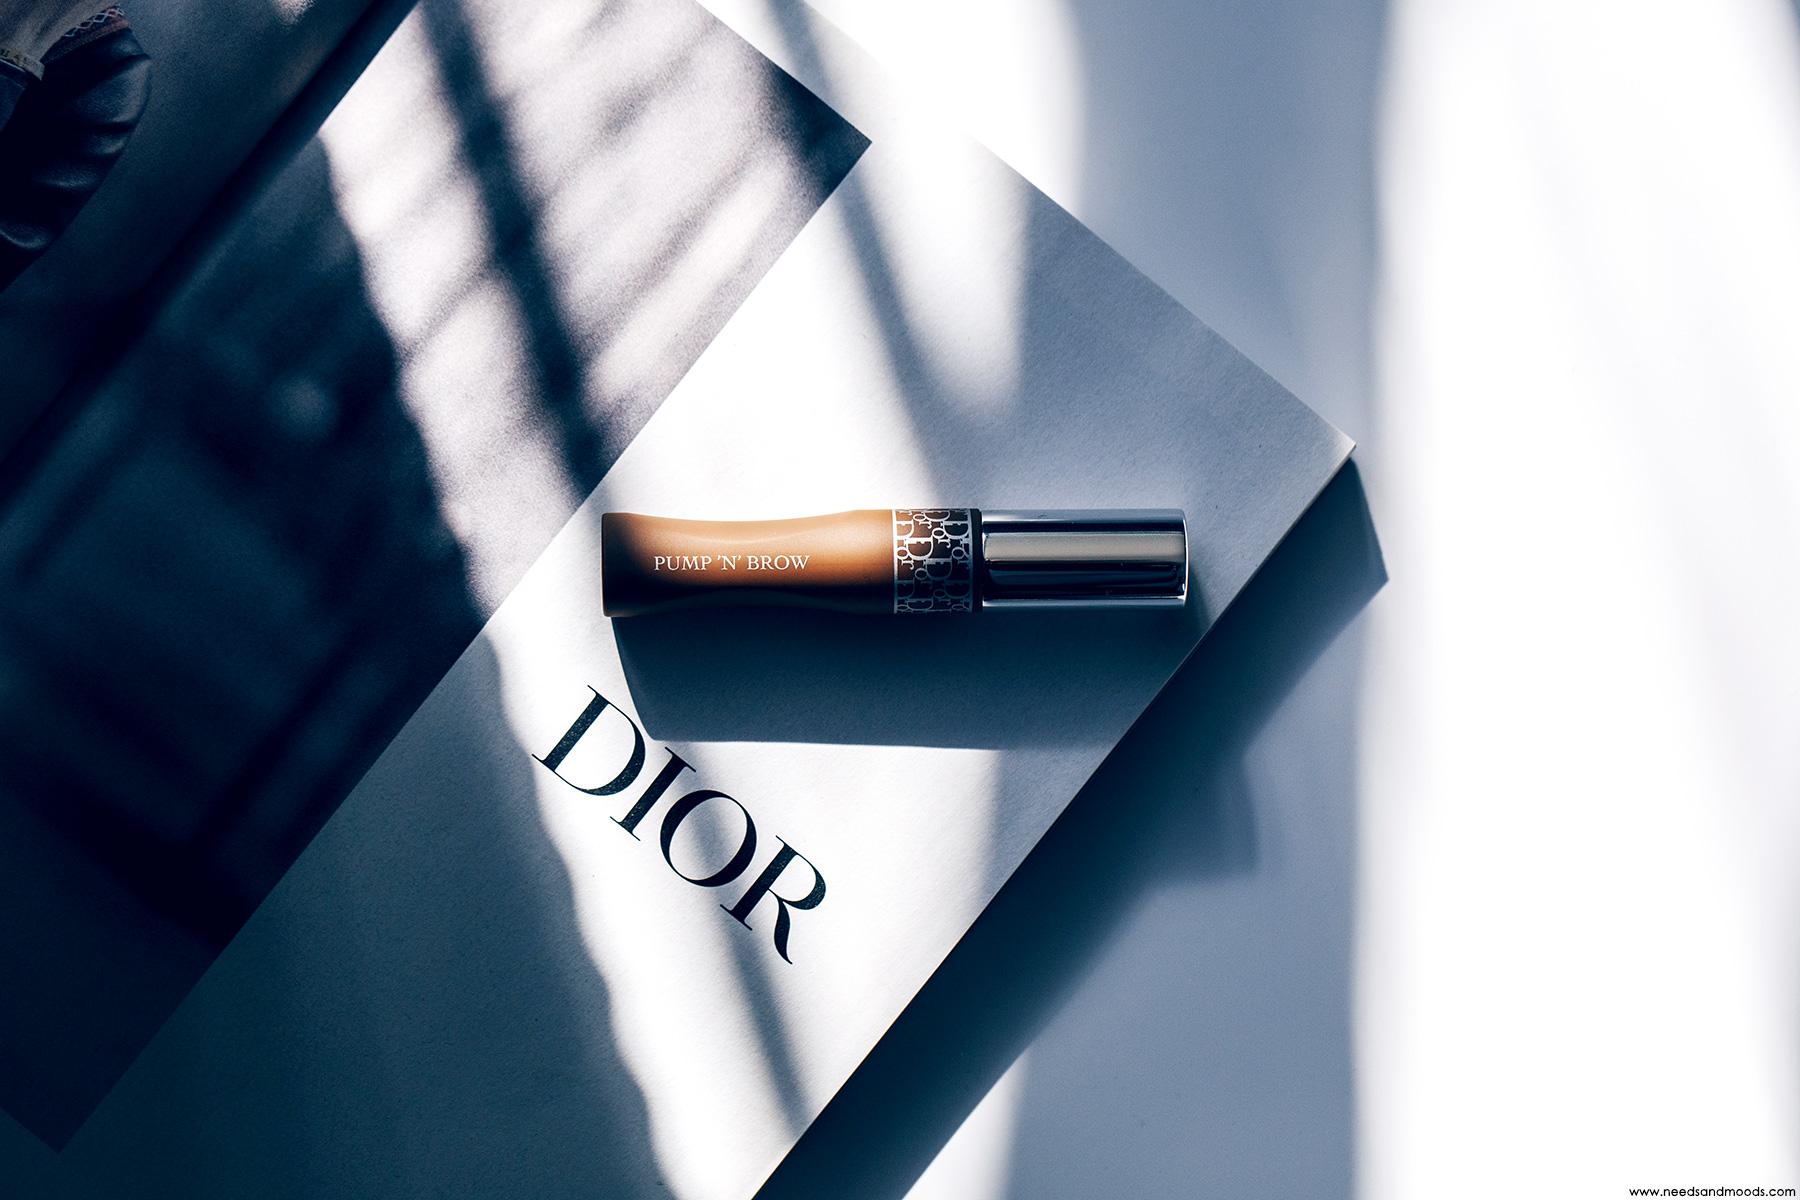 Diorshow pump n brow Dior